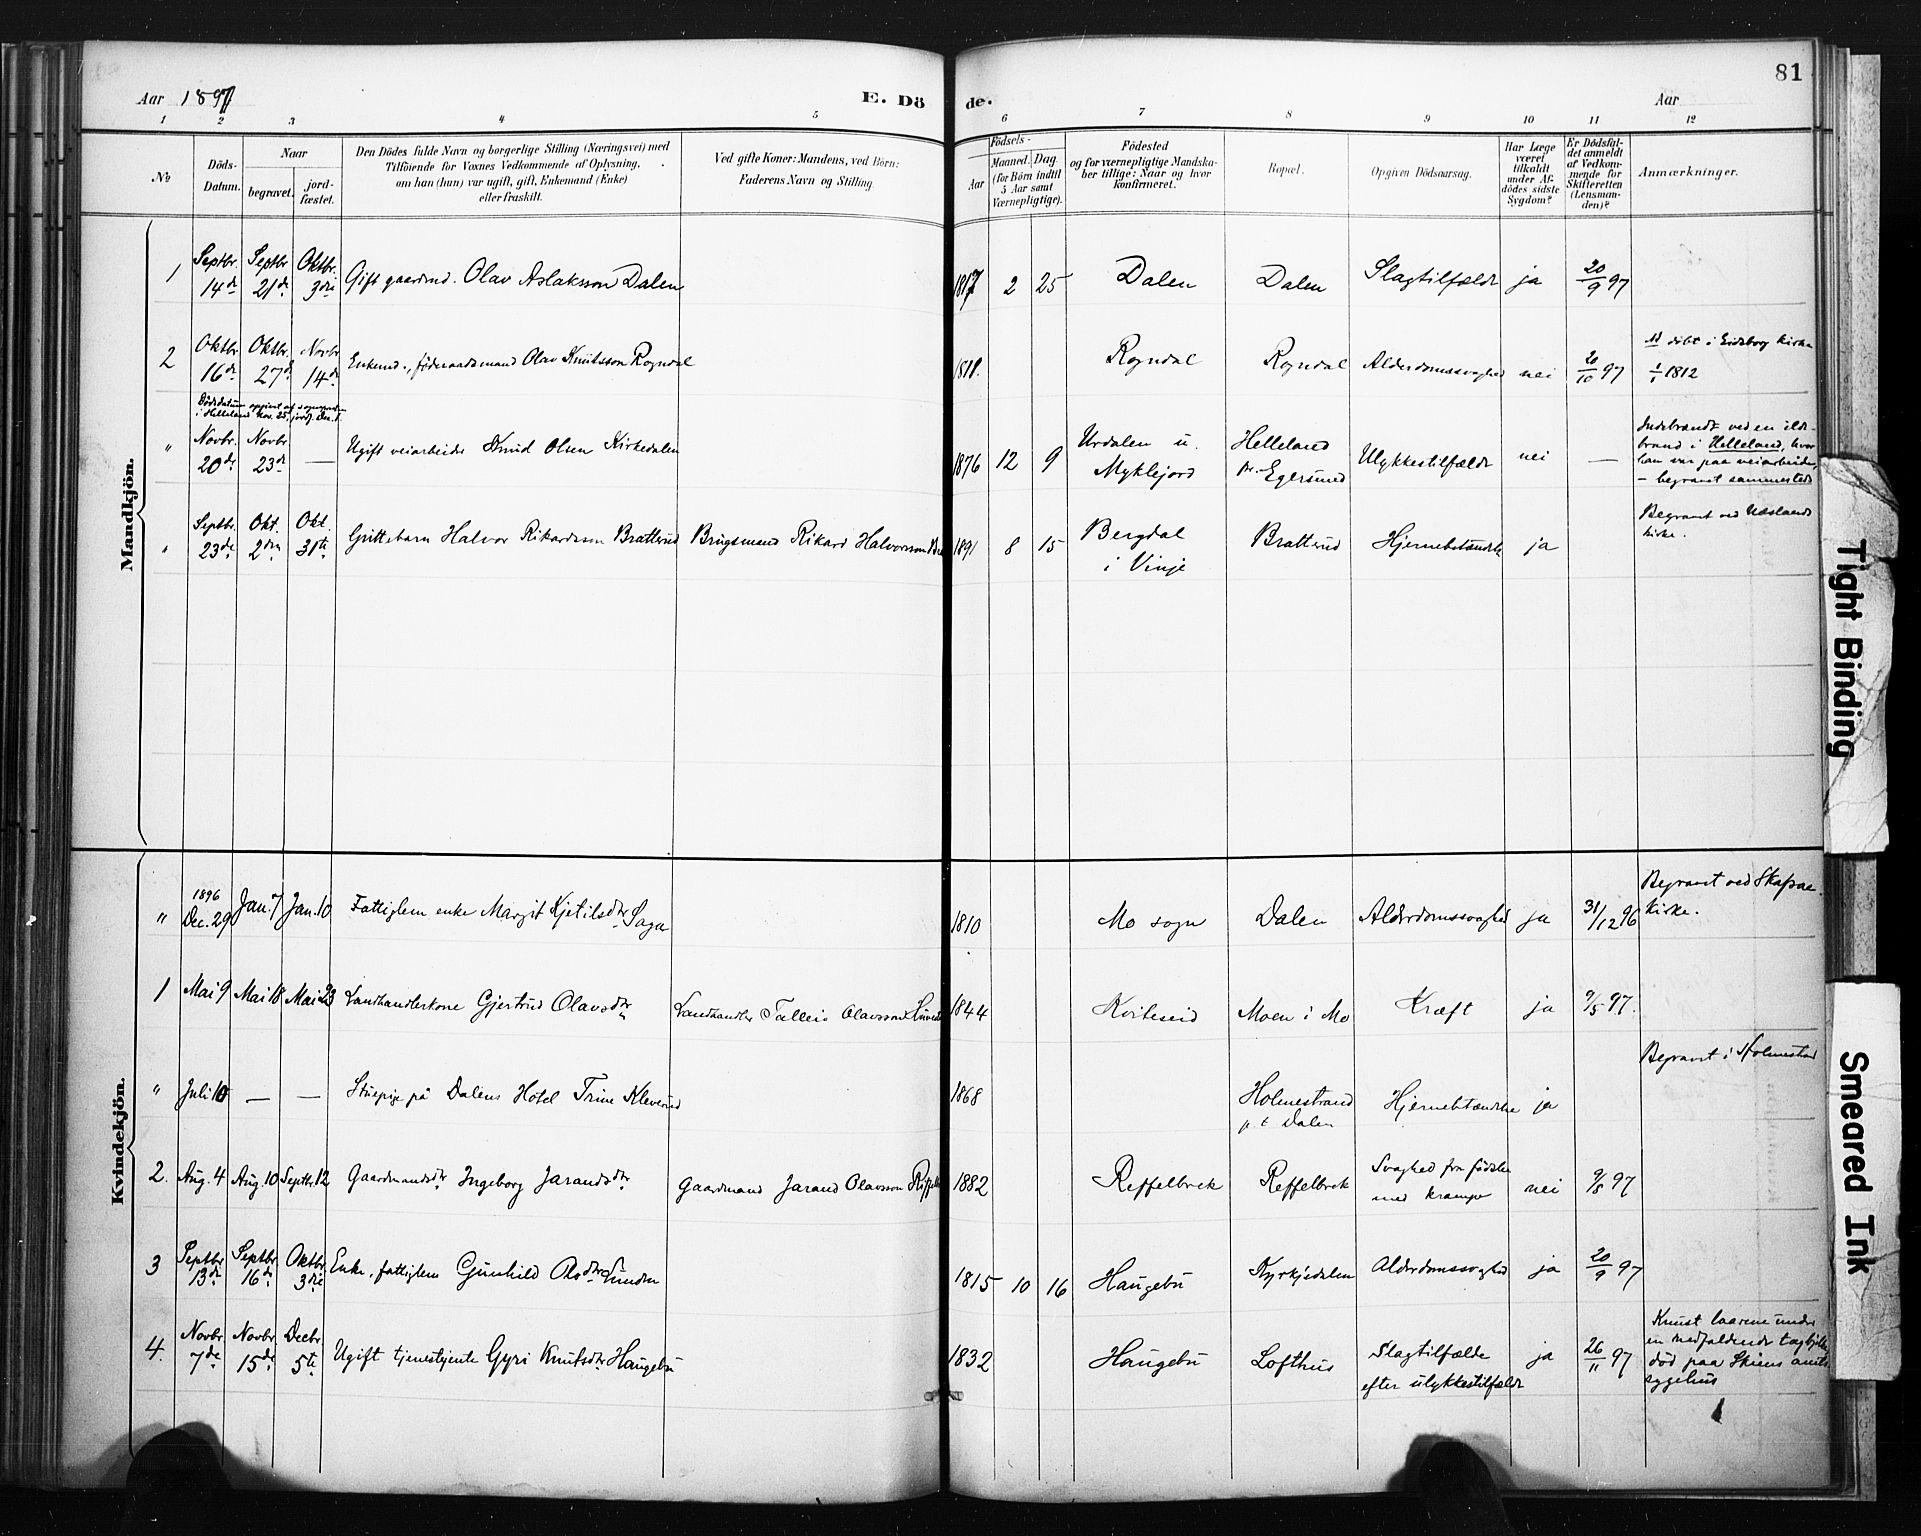 SAKO, Lårdal kirkebøker, F/Fb/L0002: Ministerialbok nr. II 2, 1887-1918, s. 81